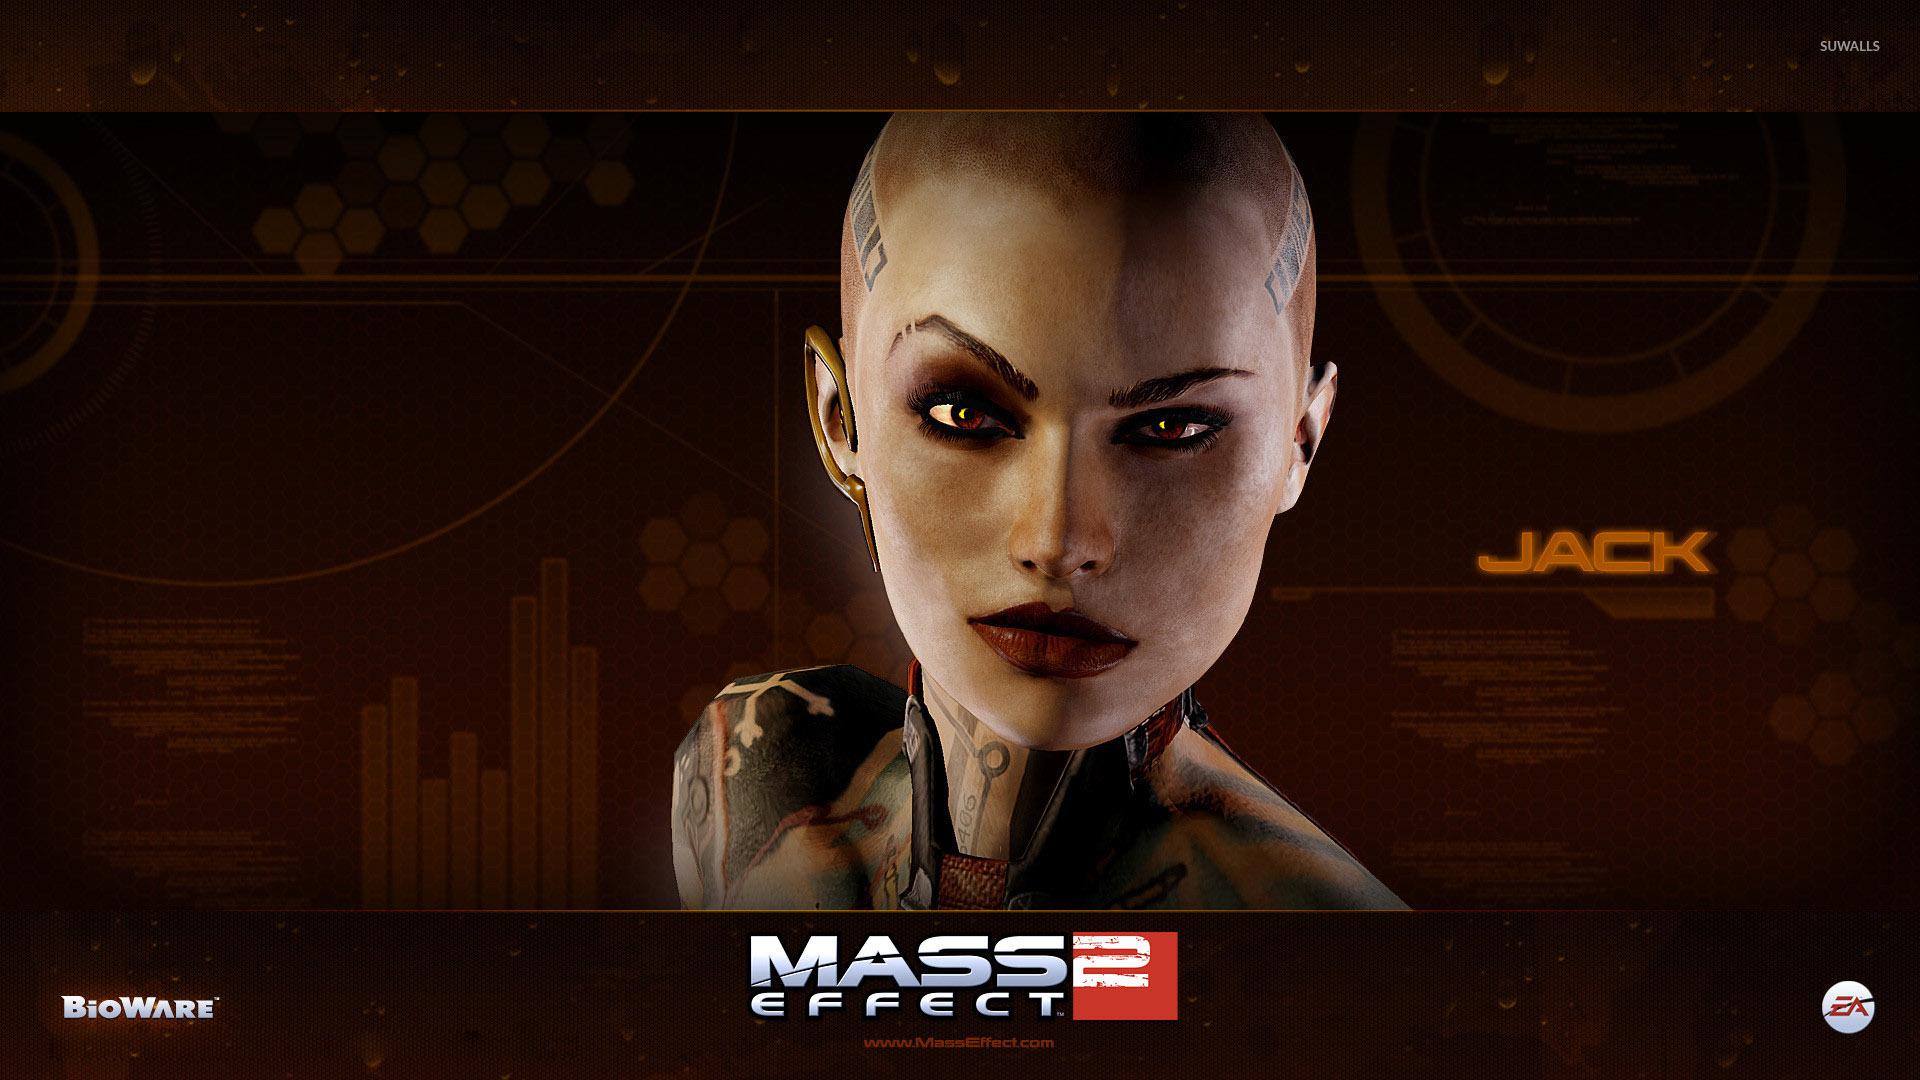 Jack Mass Effect 3 Wallpaper Game Wallpapers 29563